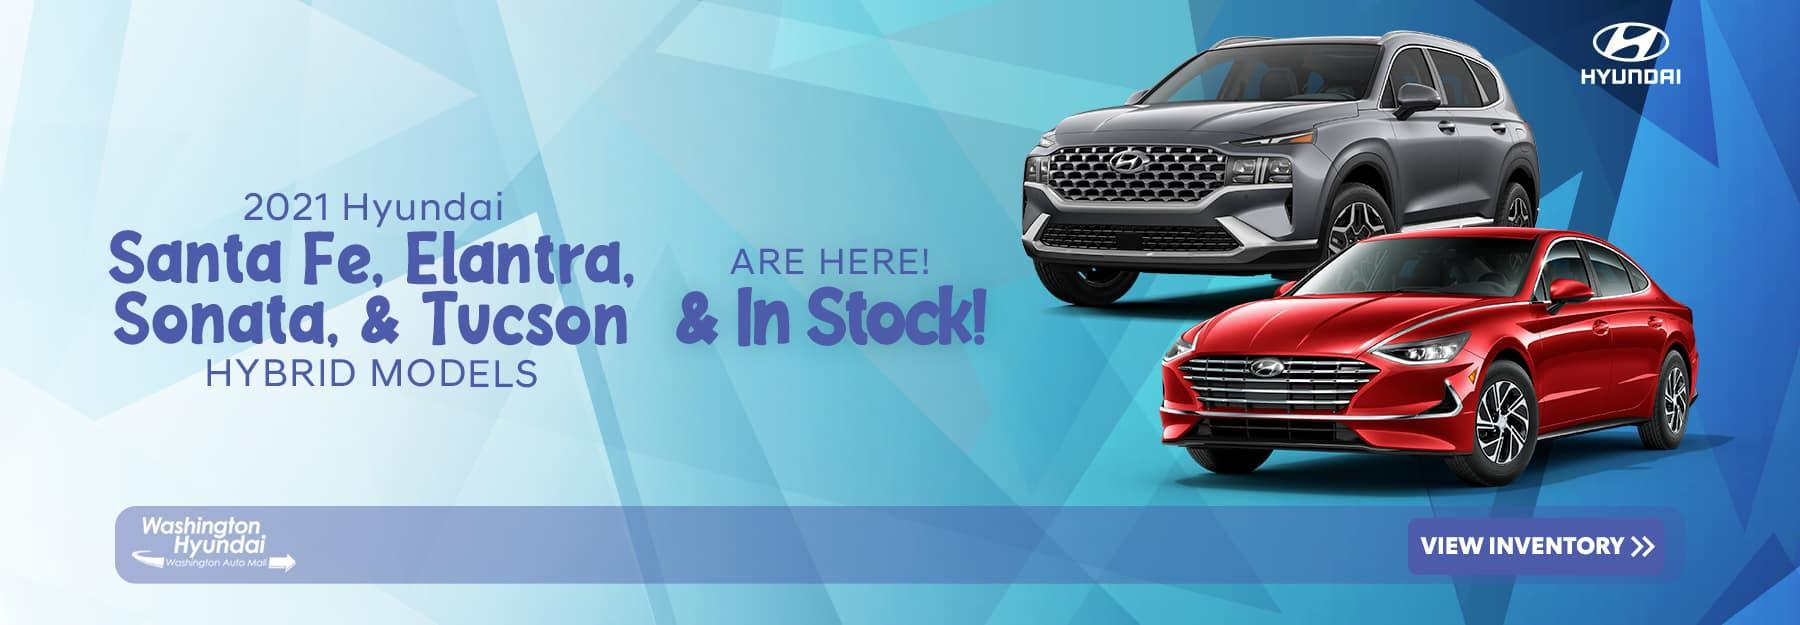 2021 Hyundai Santa Fe, Elantra, Sonata, & Tucson hybrid models are here & in stock!